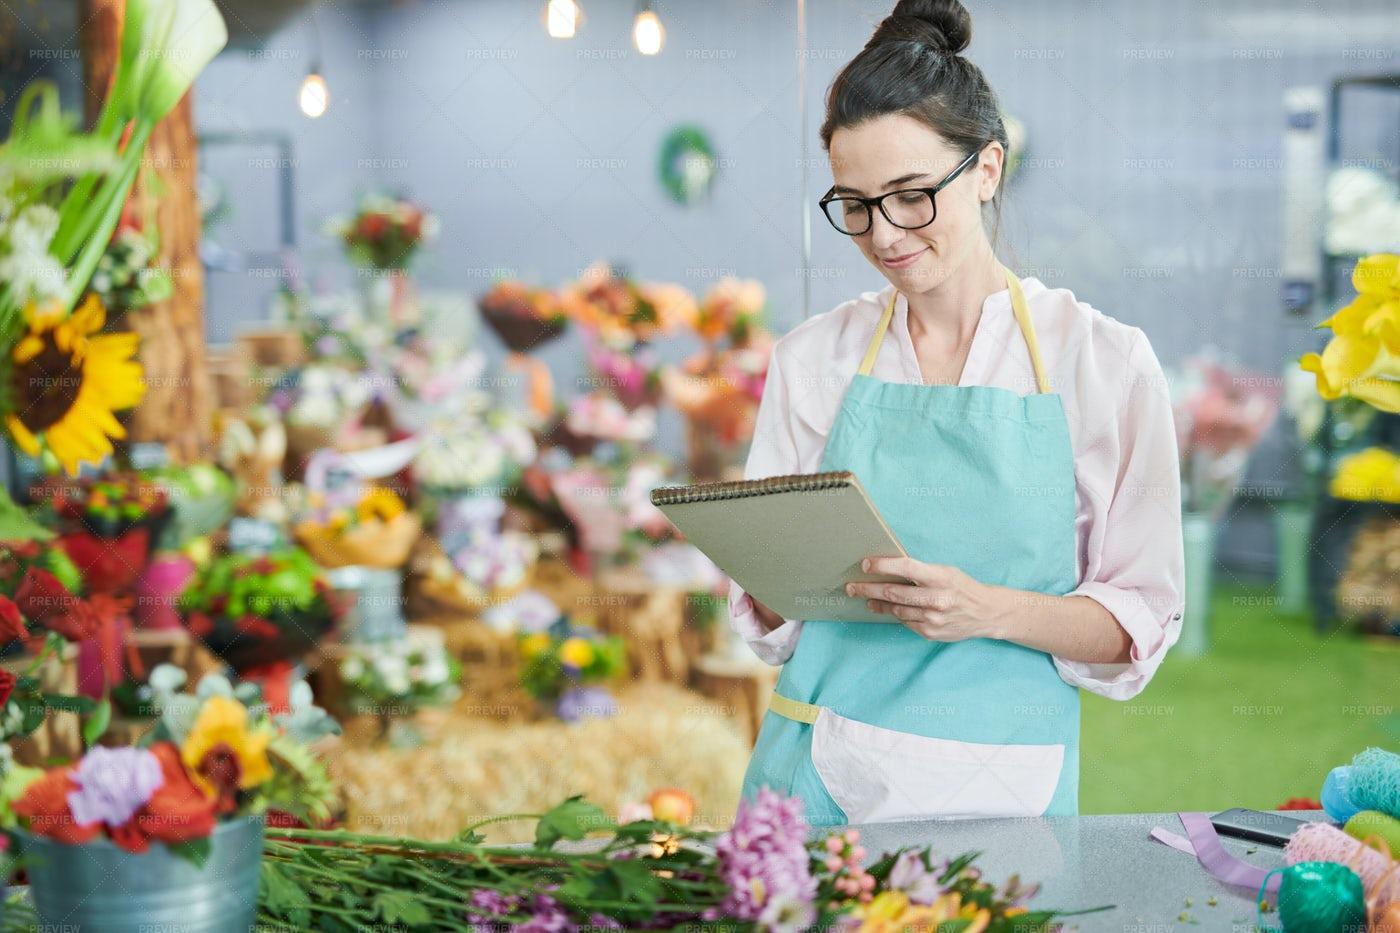 Modern Florist In Shop: Stock Photos